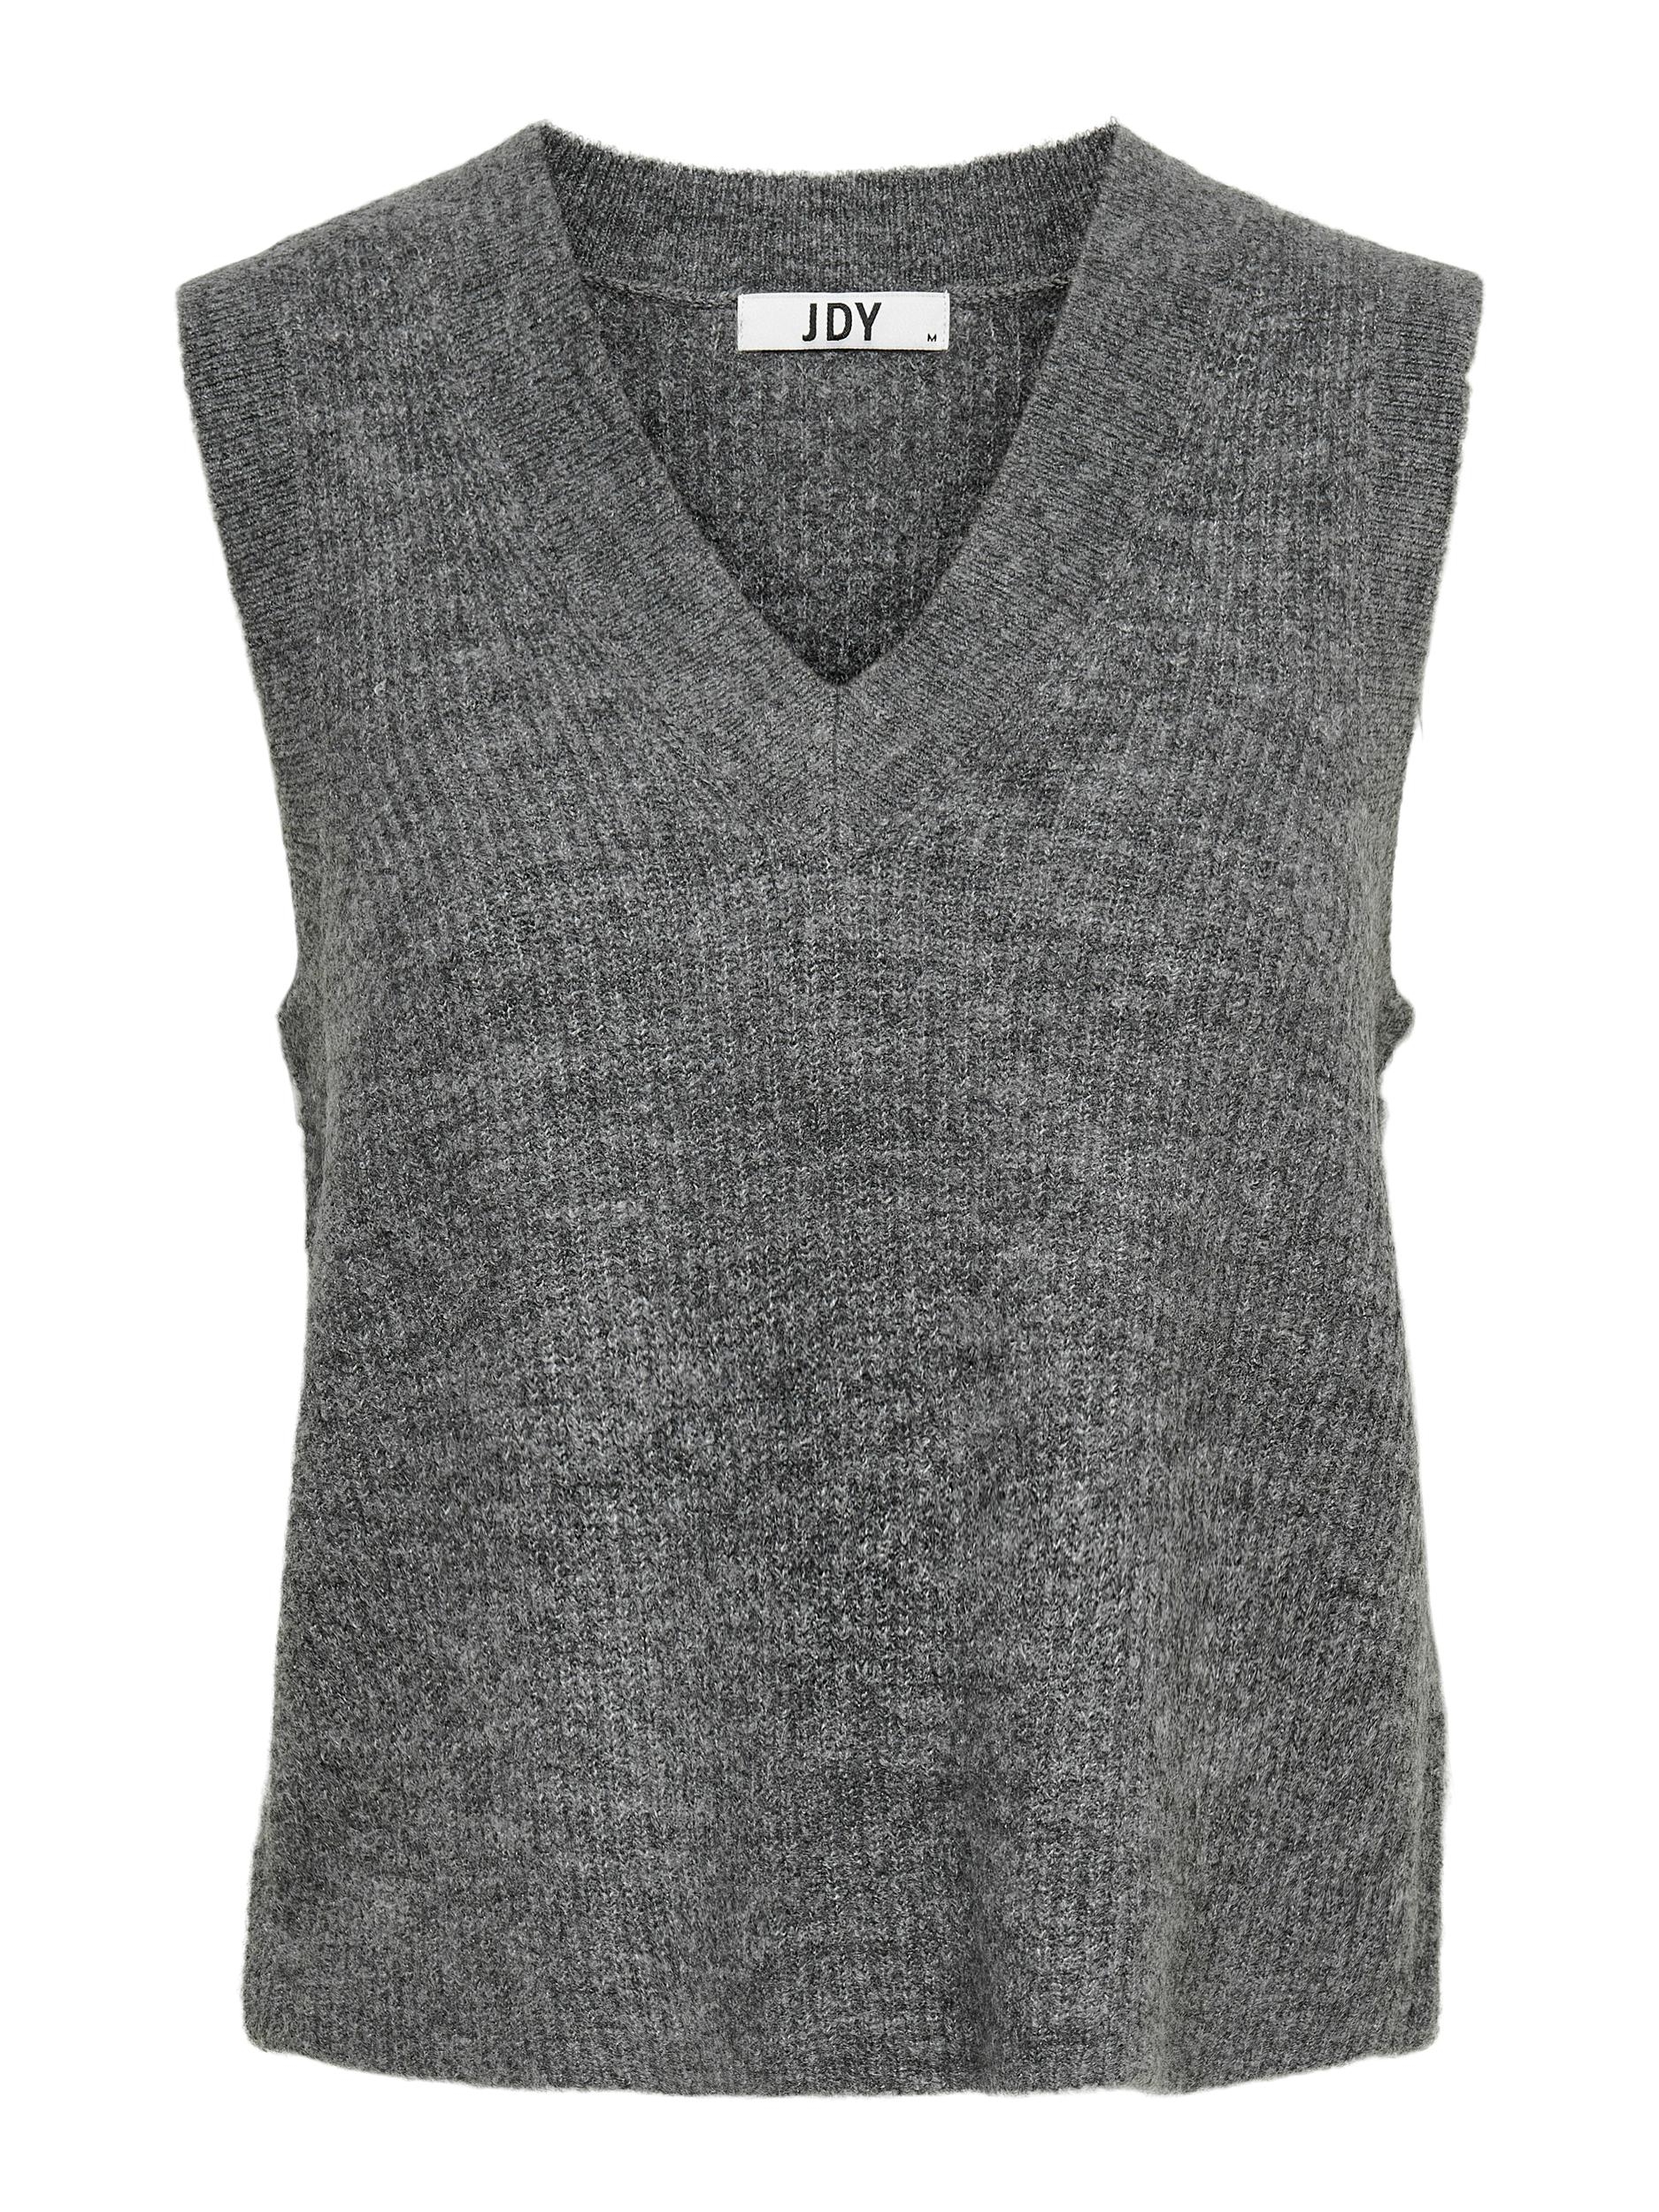 Jacqueline de Yong Elanor vest, dark grey melange, x-large